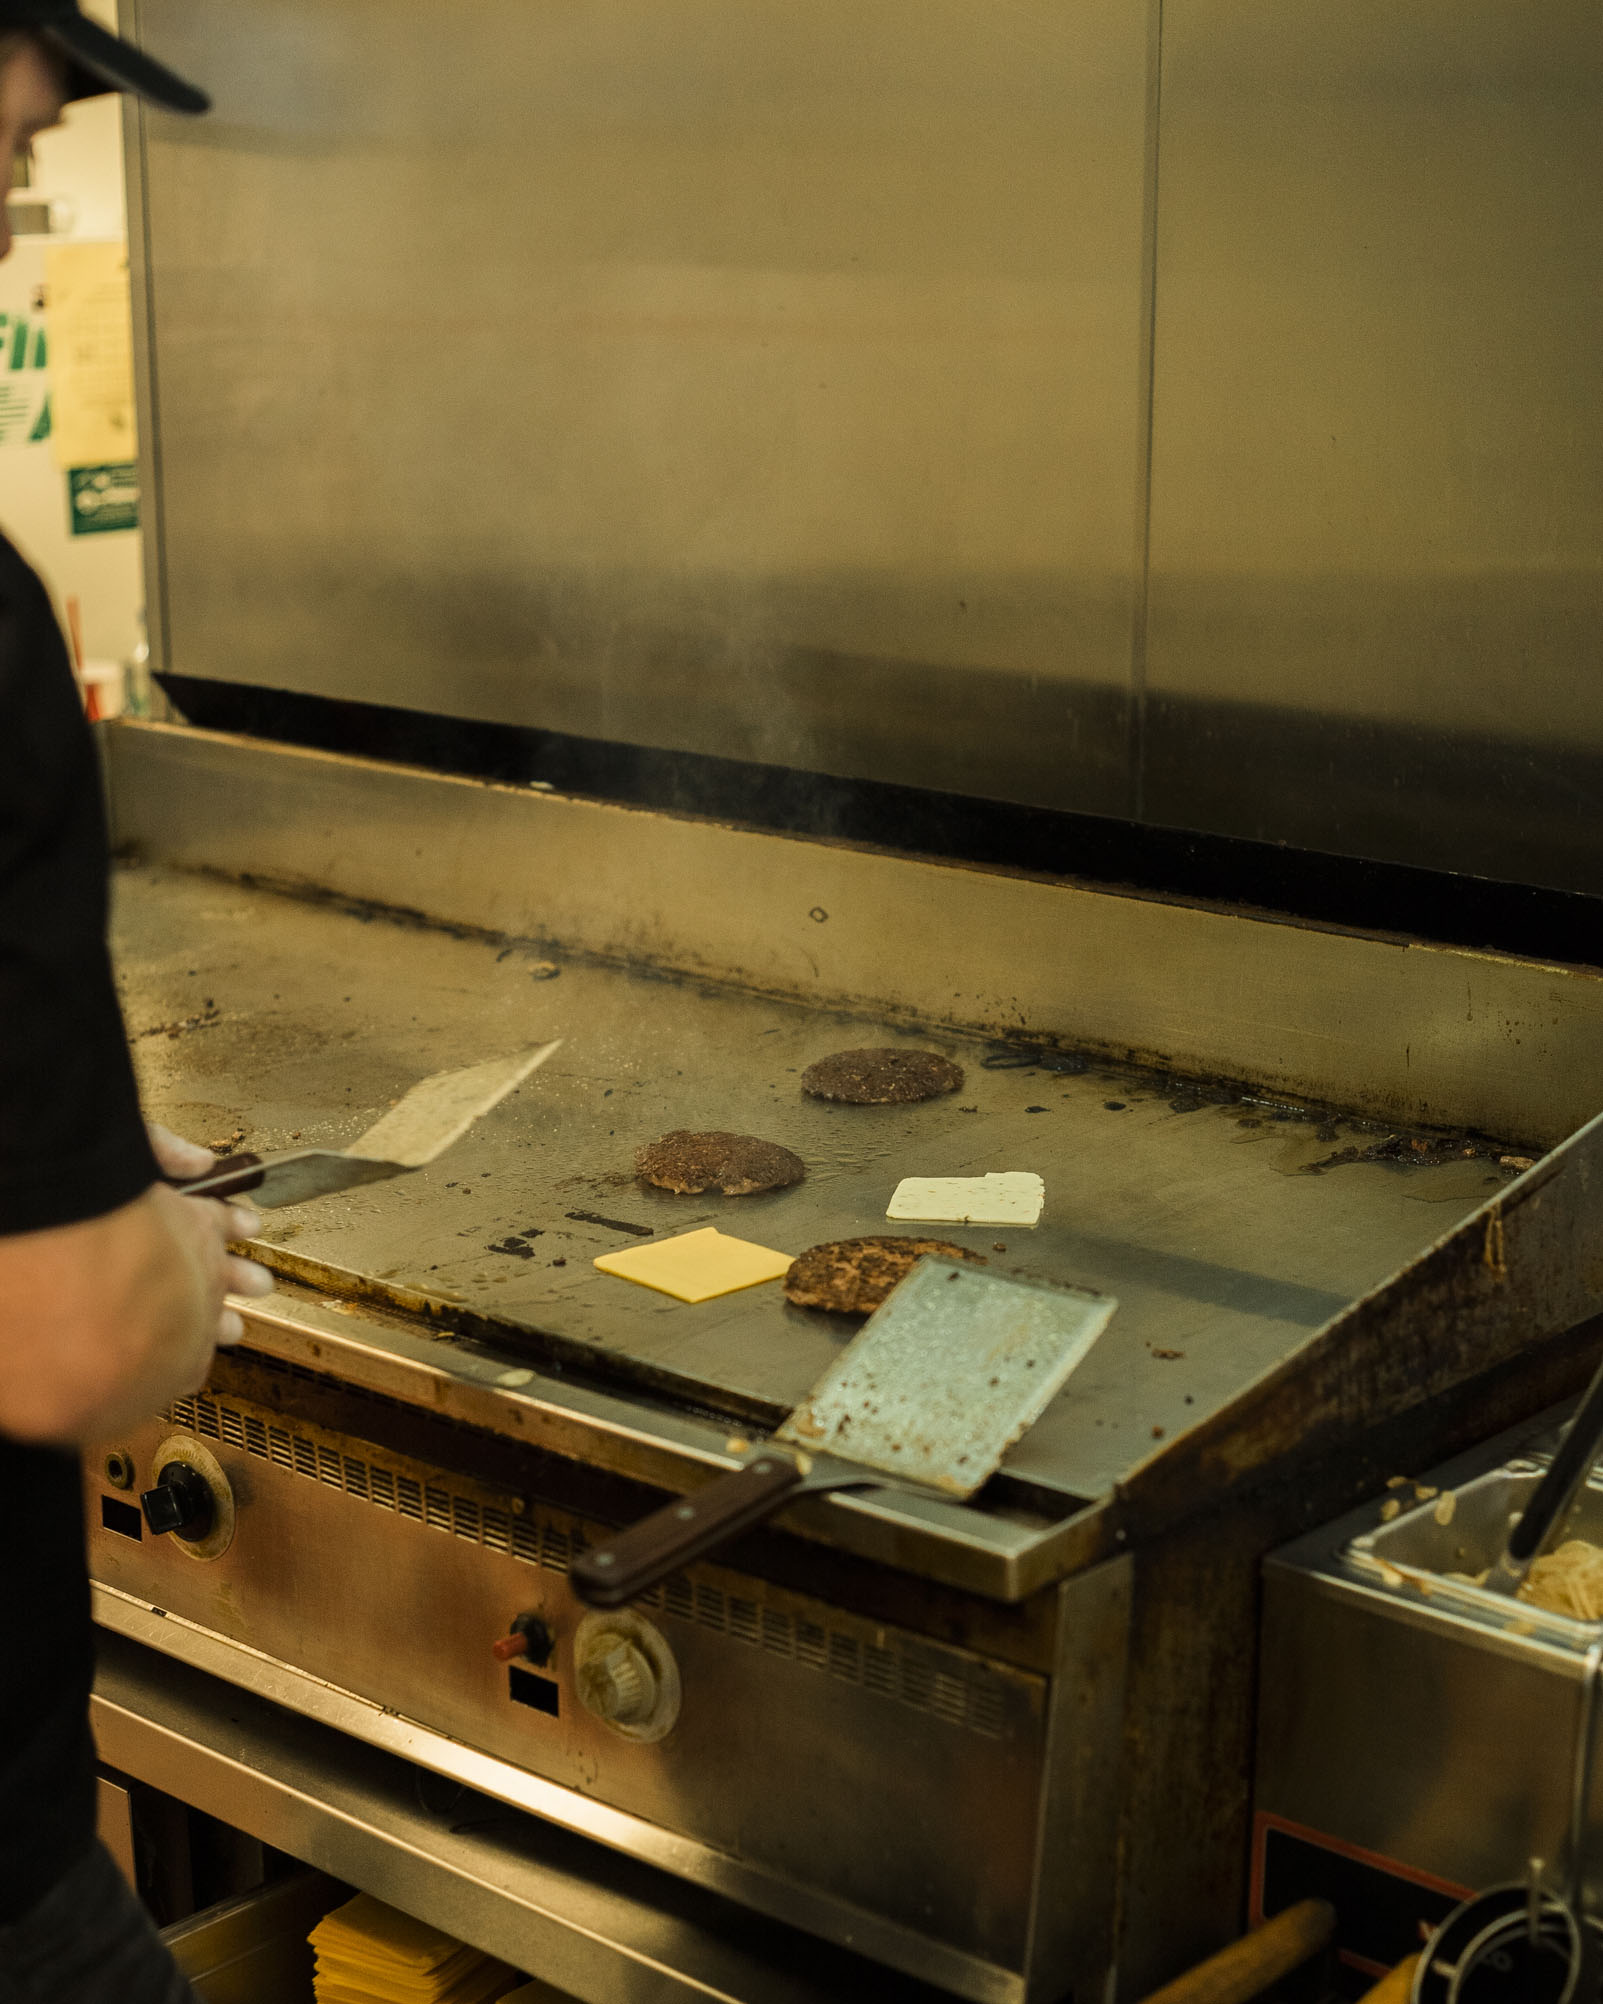 tonyburgers-big-american-story-01305.jpg